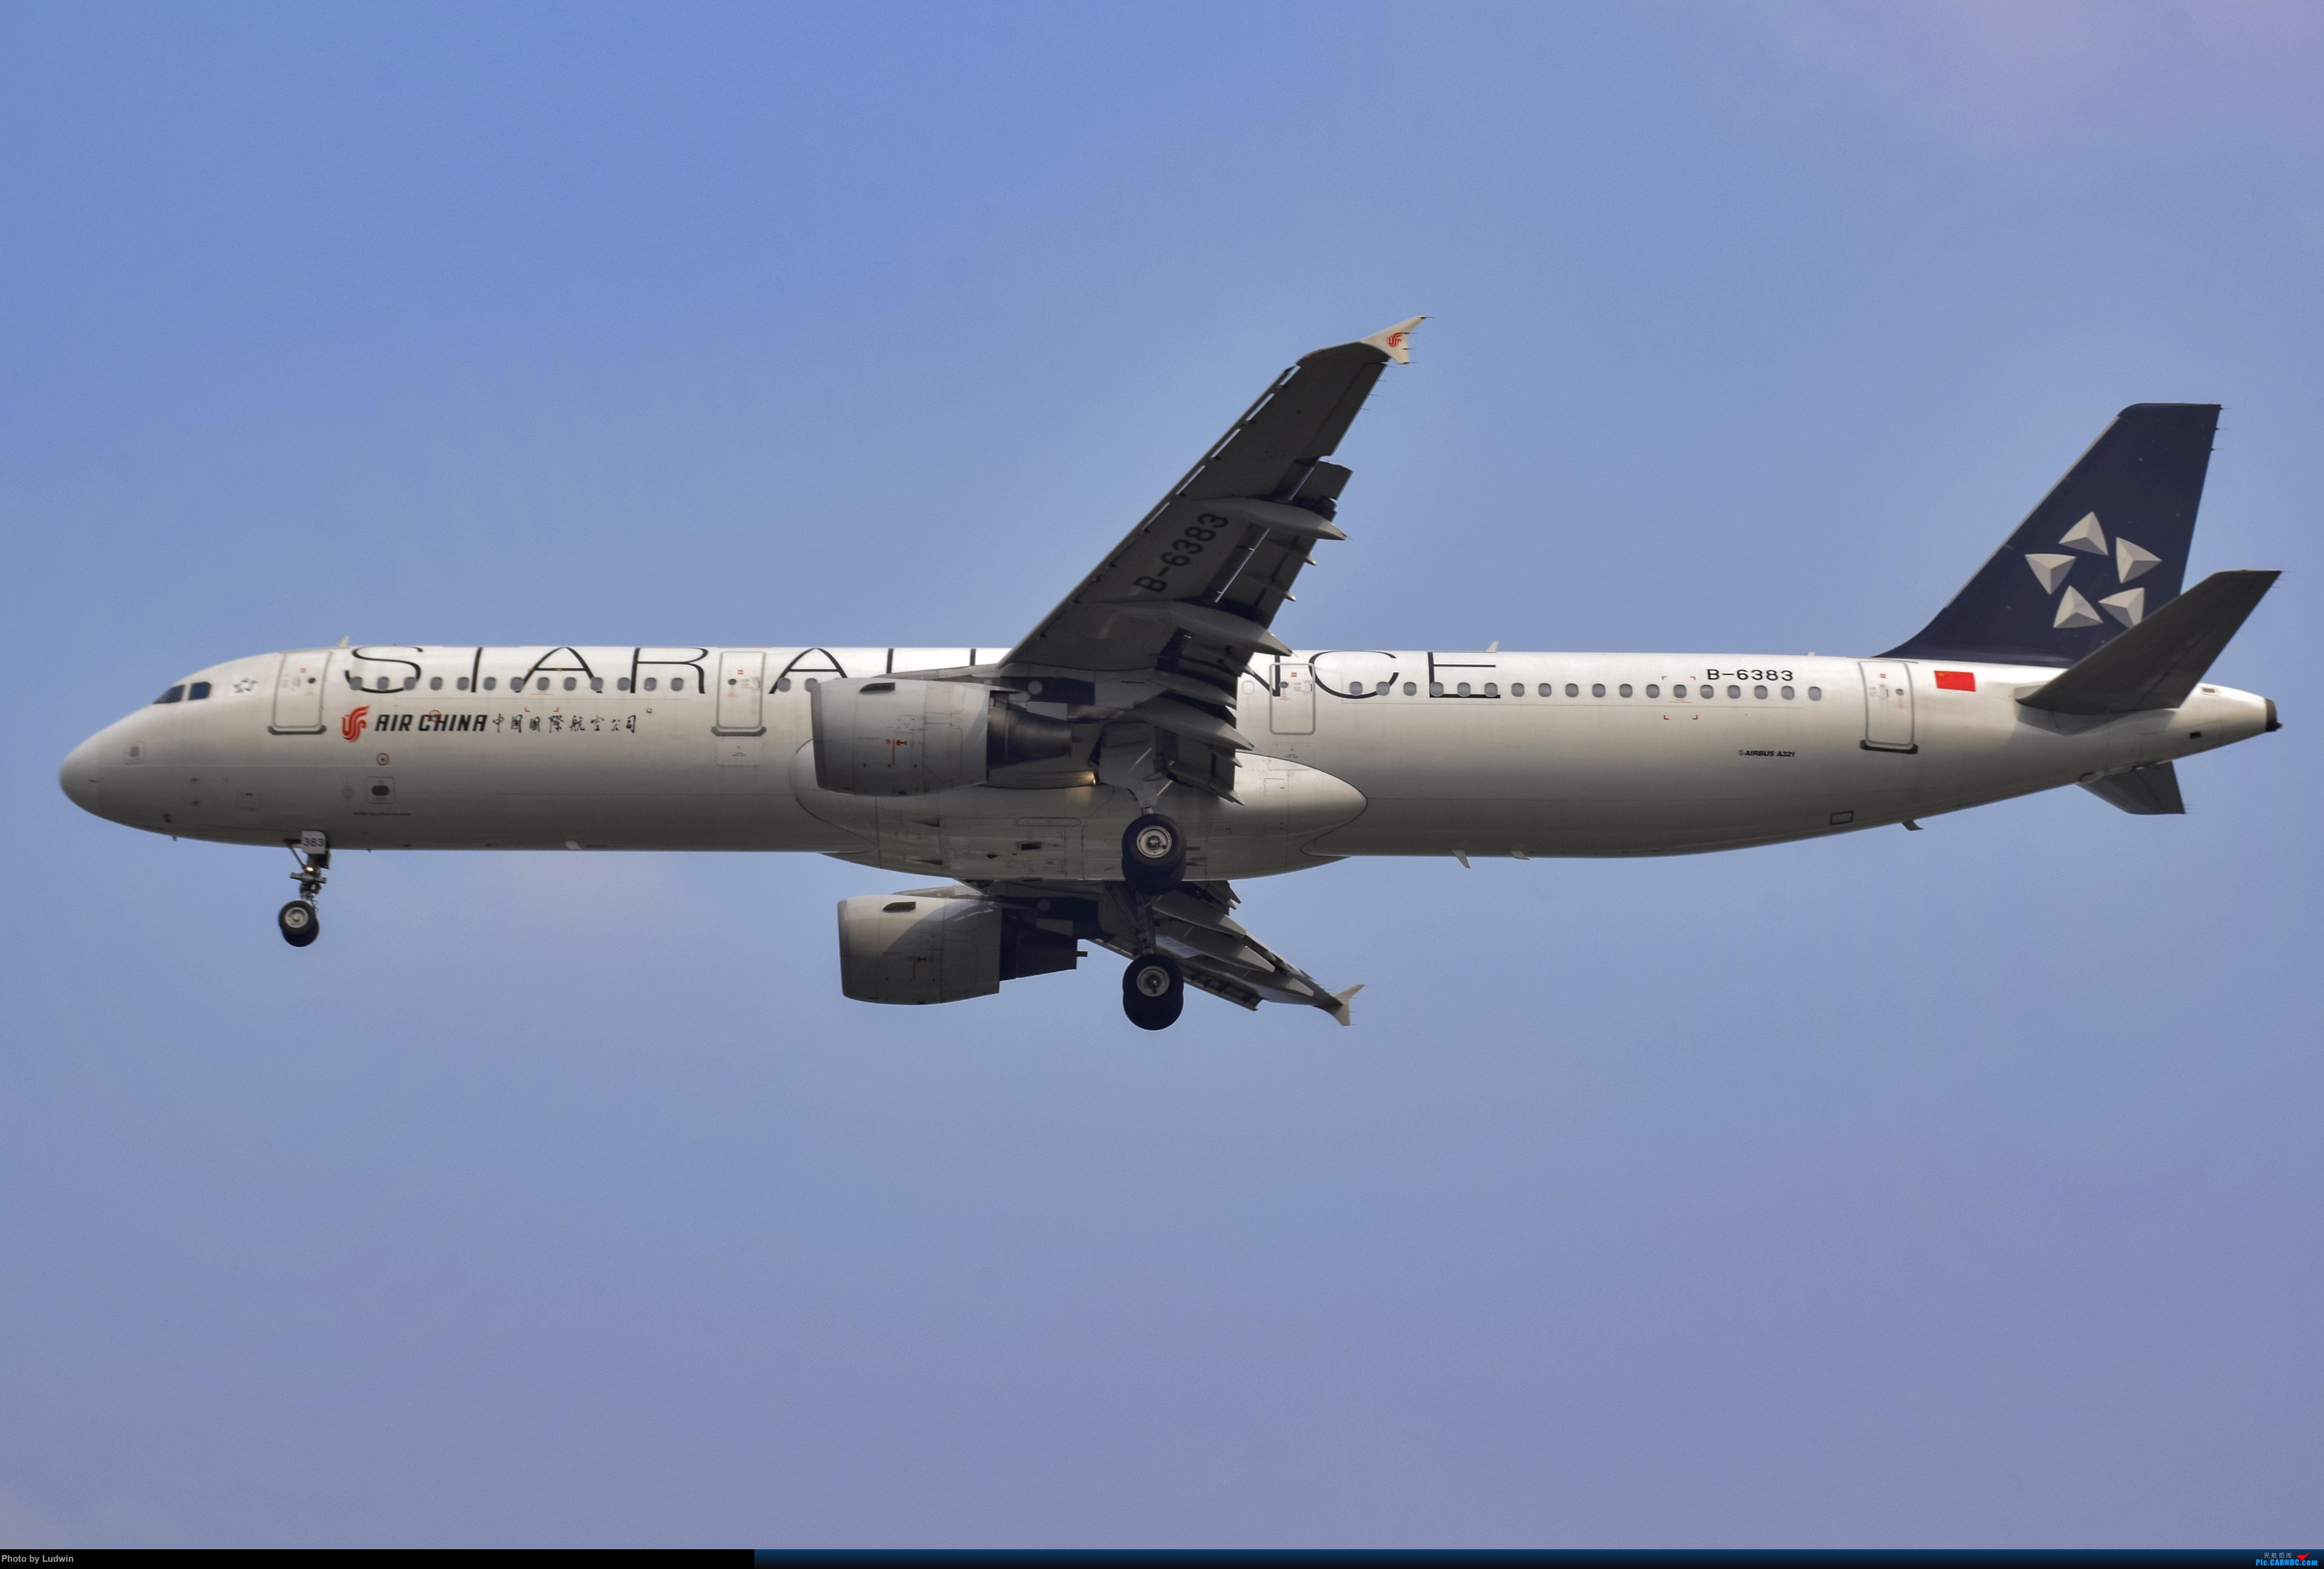 Re:[原创]没有地景系列 AIRBUS A321-200 B-6383 中国重庆江北国际机场